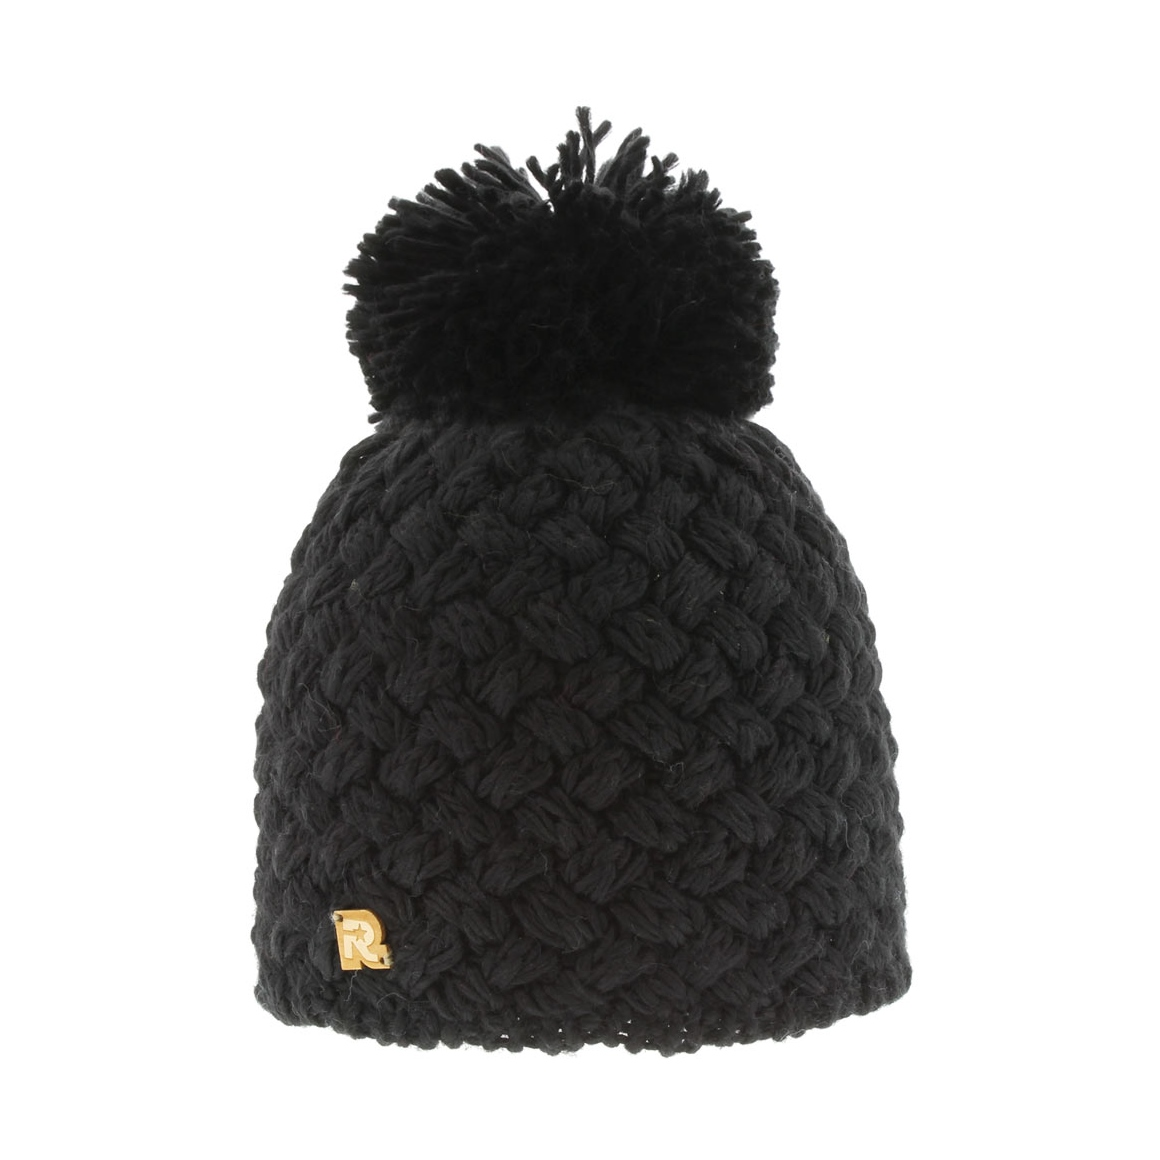 black ice 8100 pompon beanie herman. Black Bedroom Furniture Sets. Home Design Ideas